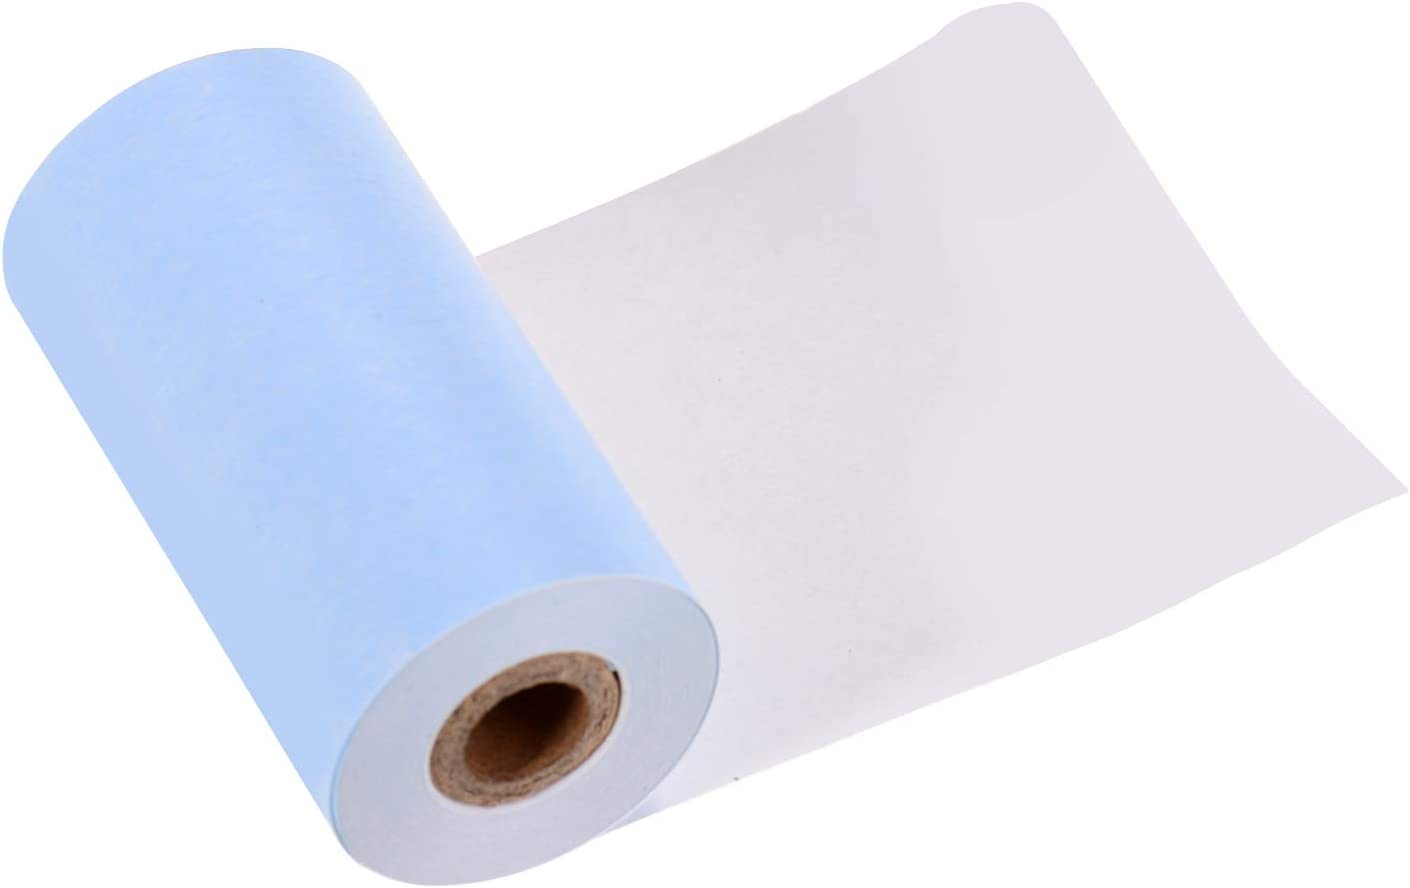 3 Rollen Kompatibel mit Poooli Thermodrucker 2,17 * 1,18 Zoll Topuality Poooli Buntes leeres Thermopapier Langlebige 5-j/ährige Papierrolle BPA-frei 57 30 mm